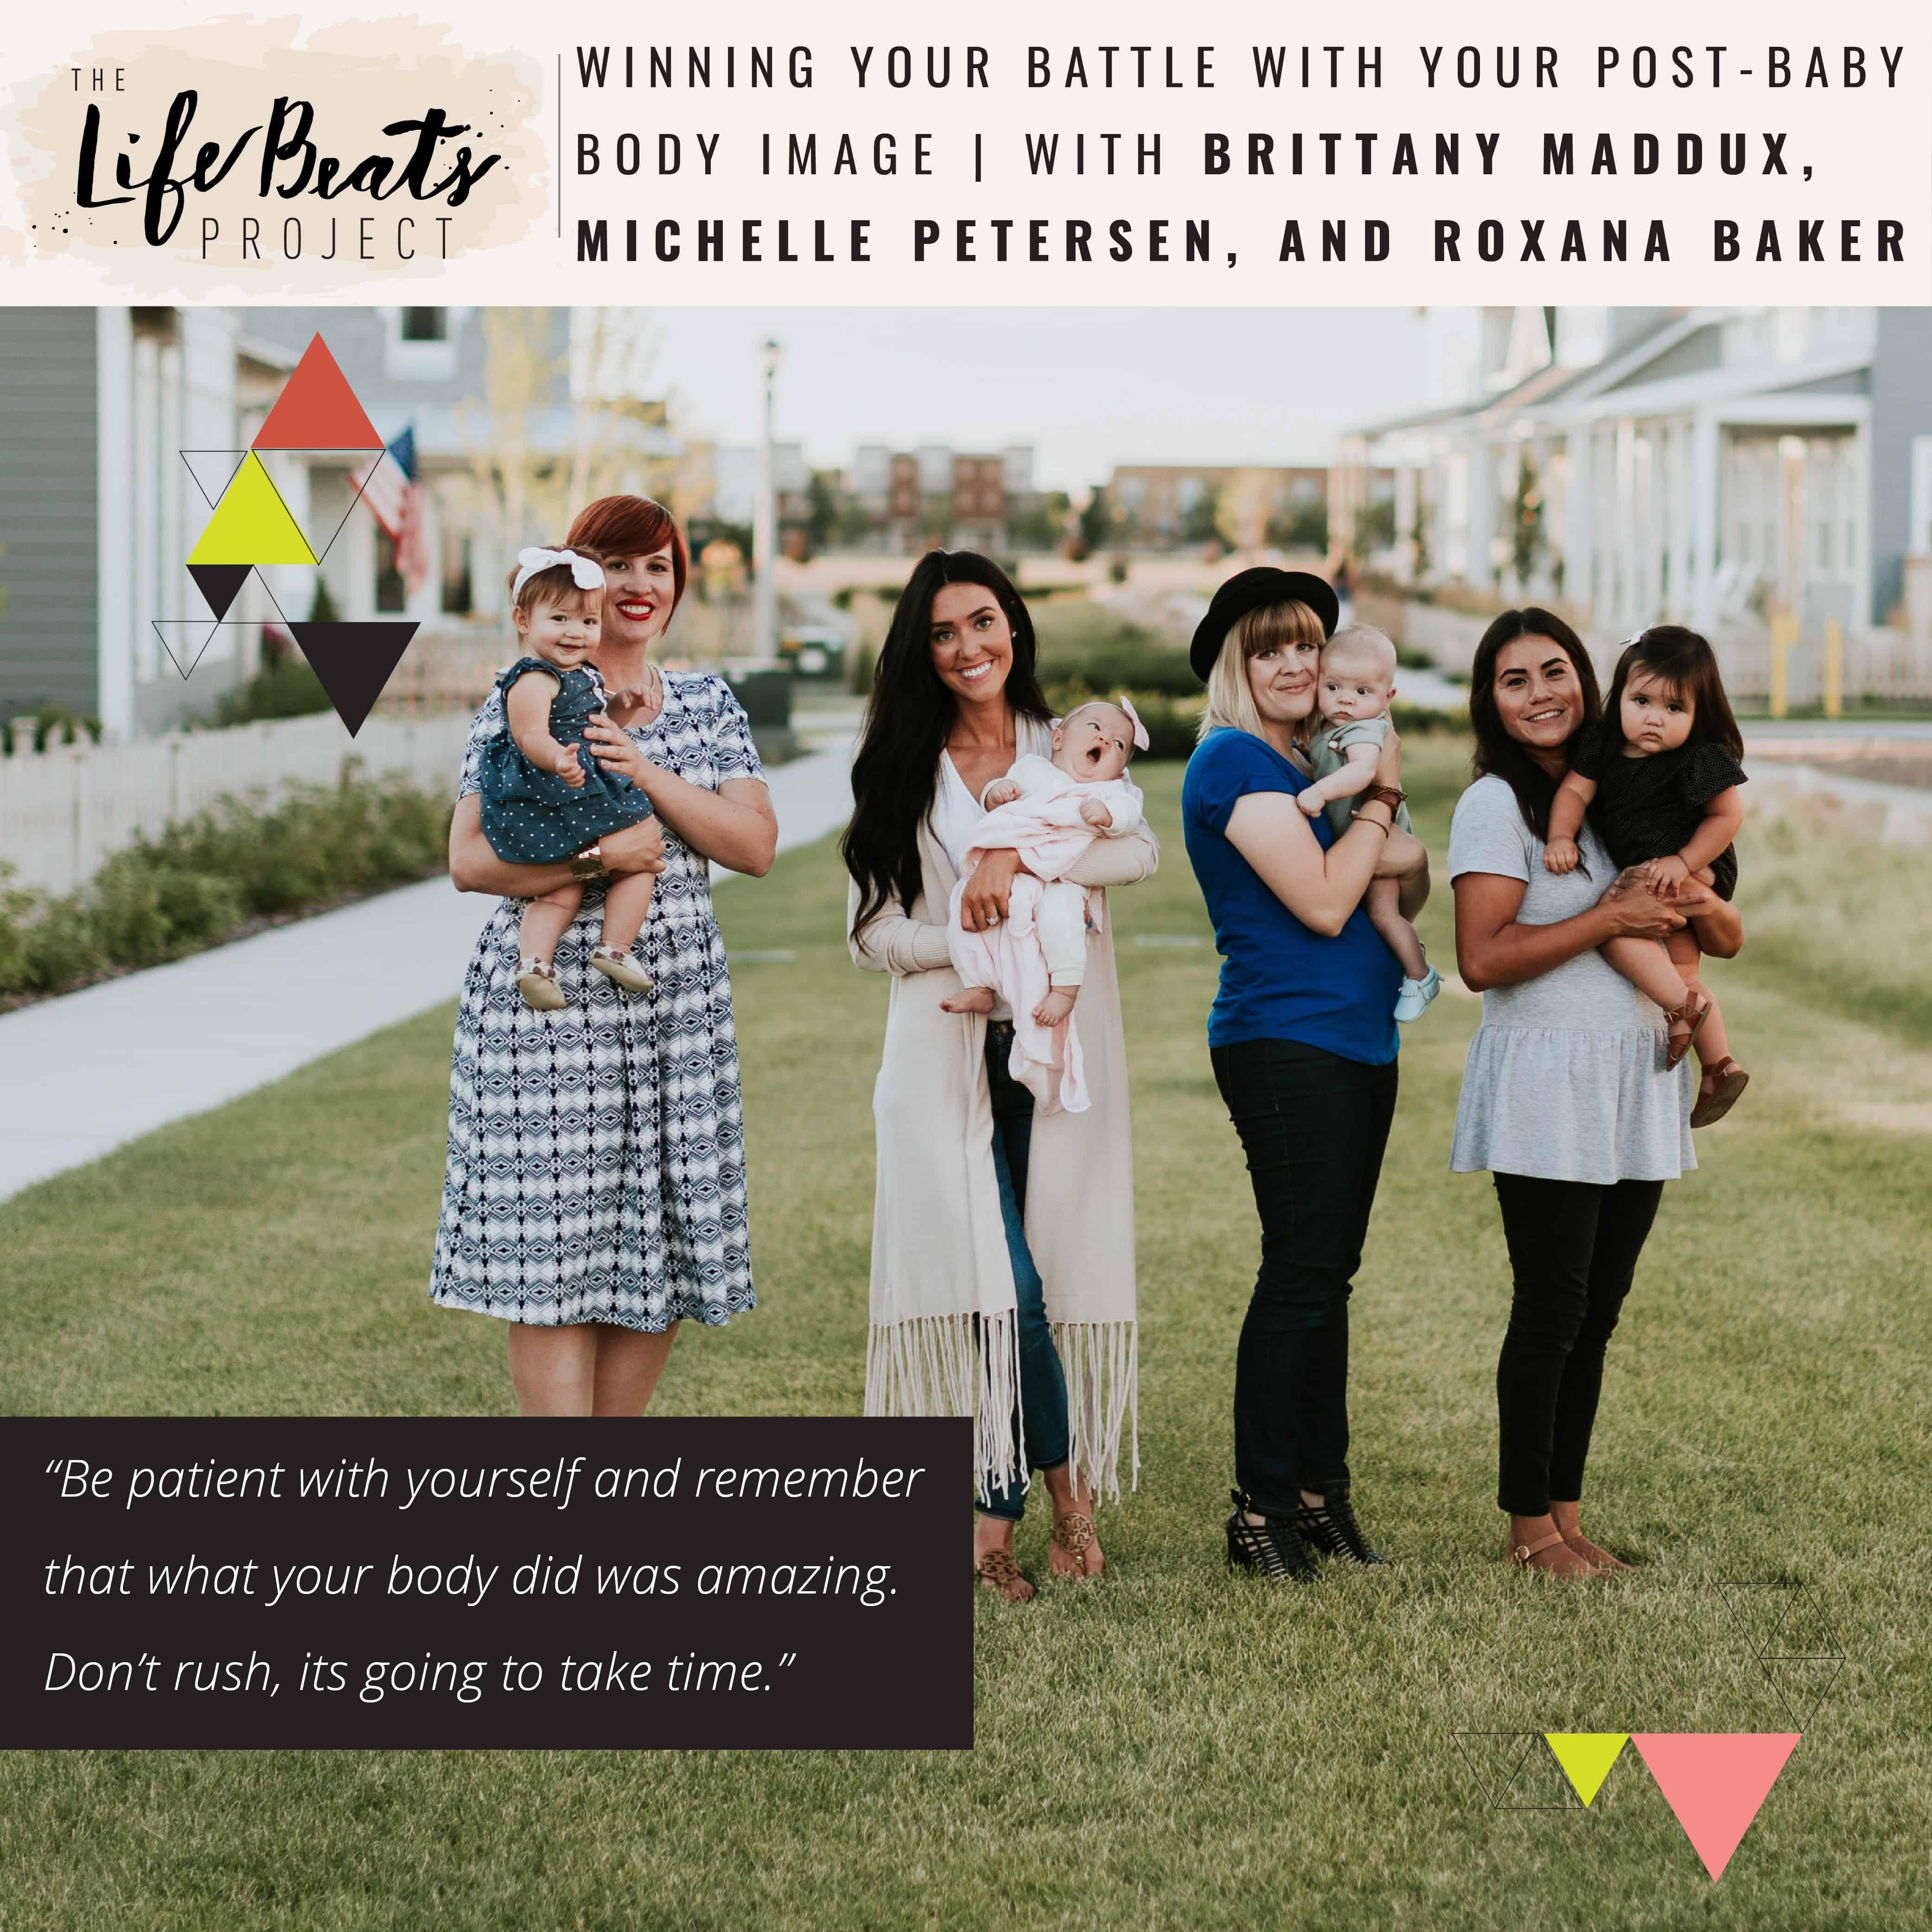 post baby body image post pregnancy self-esteem podcast motherhood women